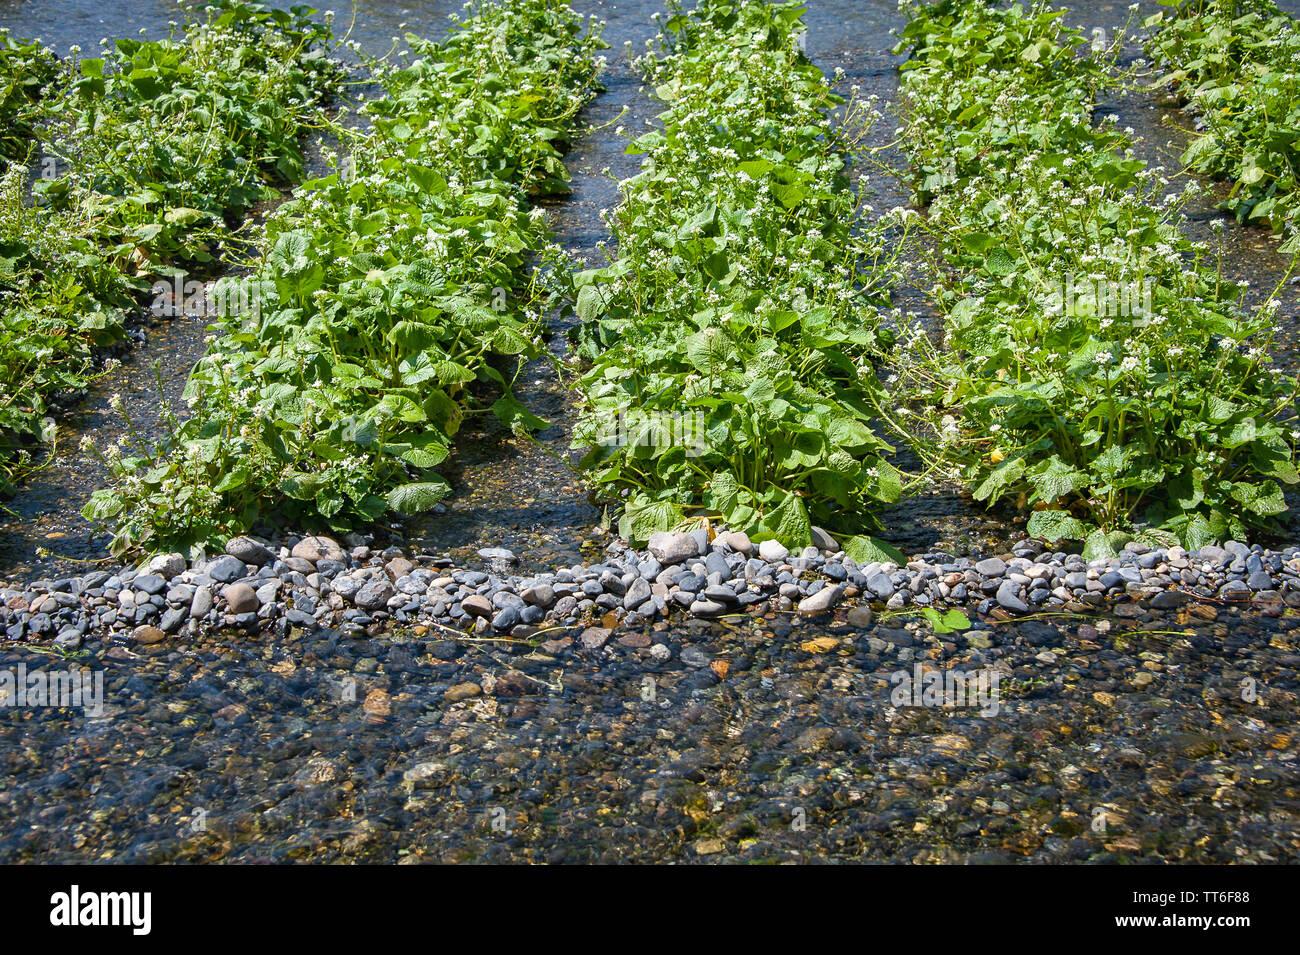 Fresh green Wasabi (Japanese Horseradish) plants growing in clear mountain river water. Stock Photo